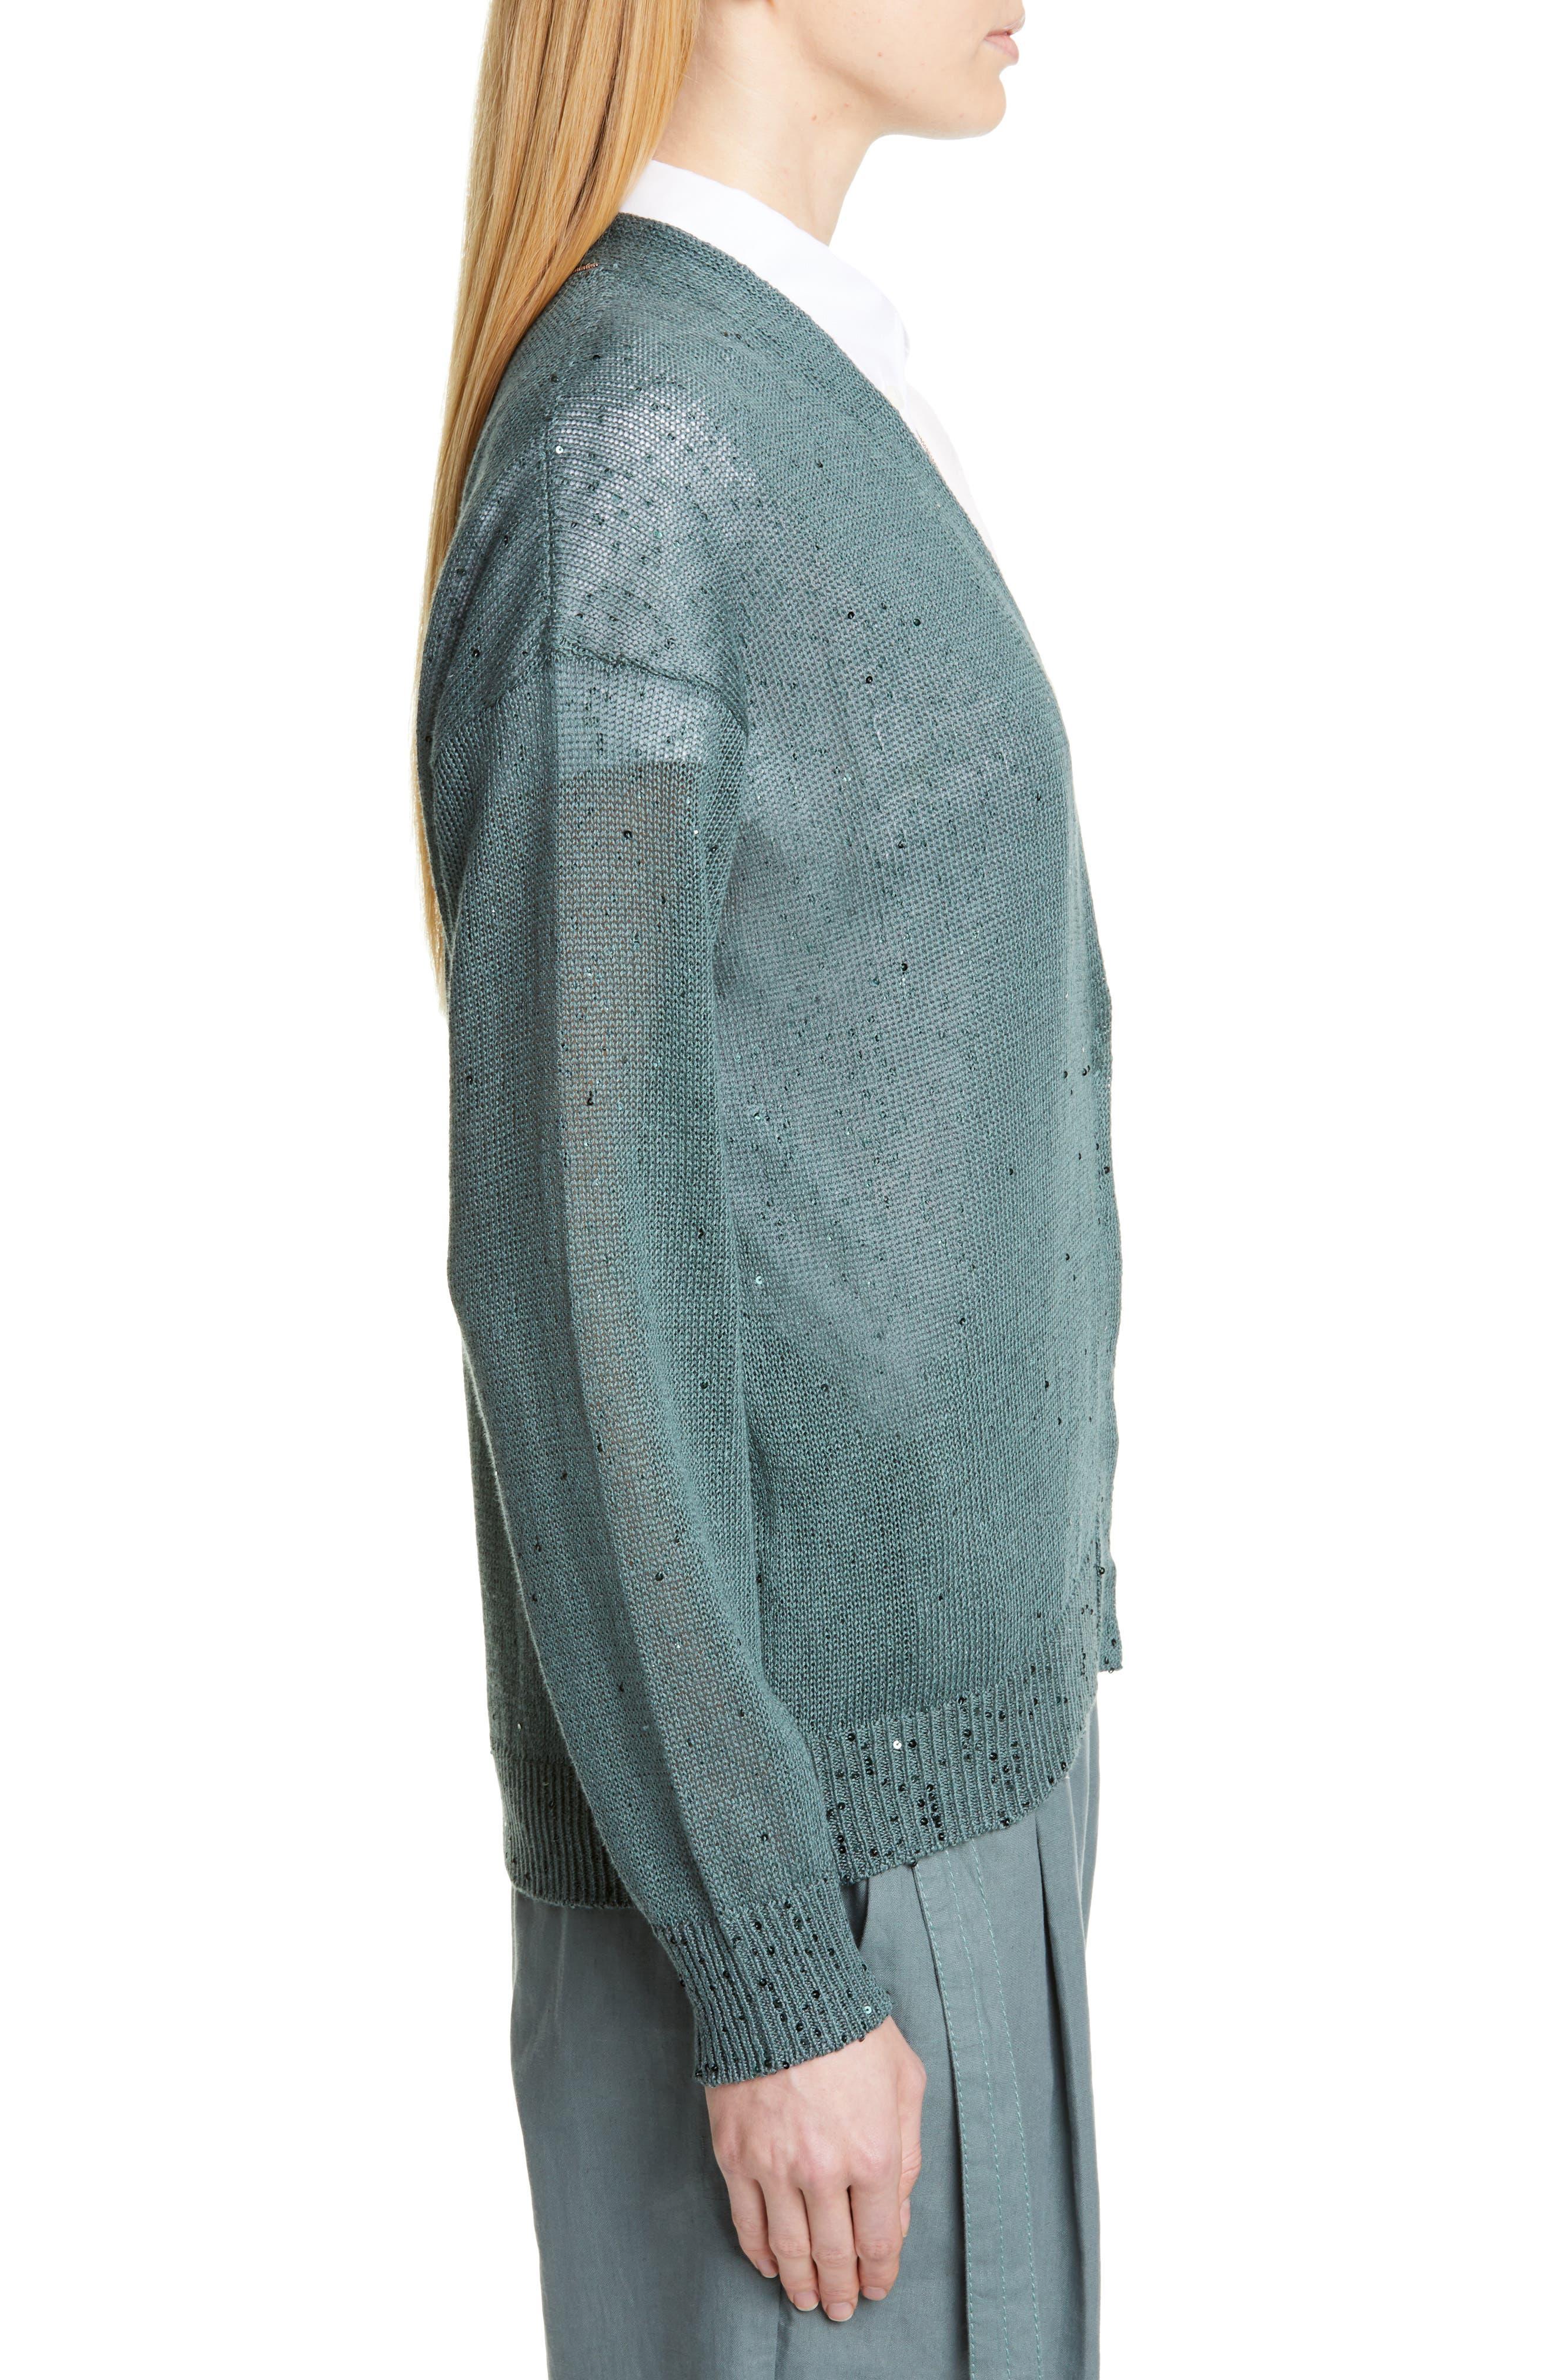 BRUNELLO CUCINELLI, Sequin Linen & Silk Cardigan, Alternate thumbnail 3, color, SAGE